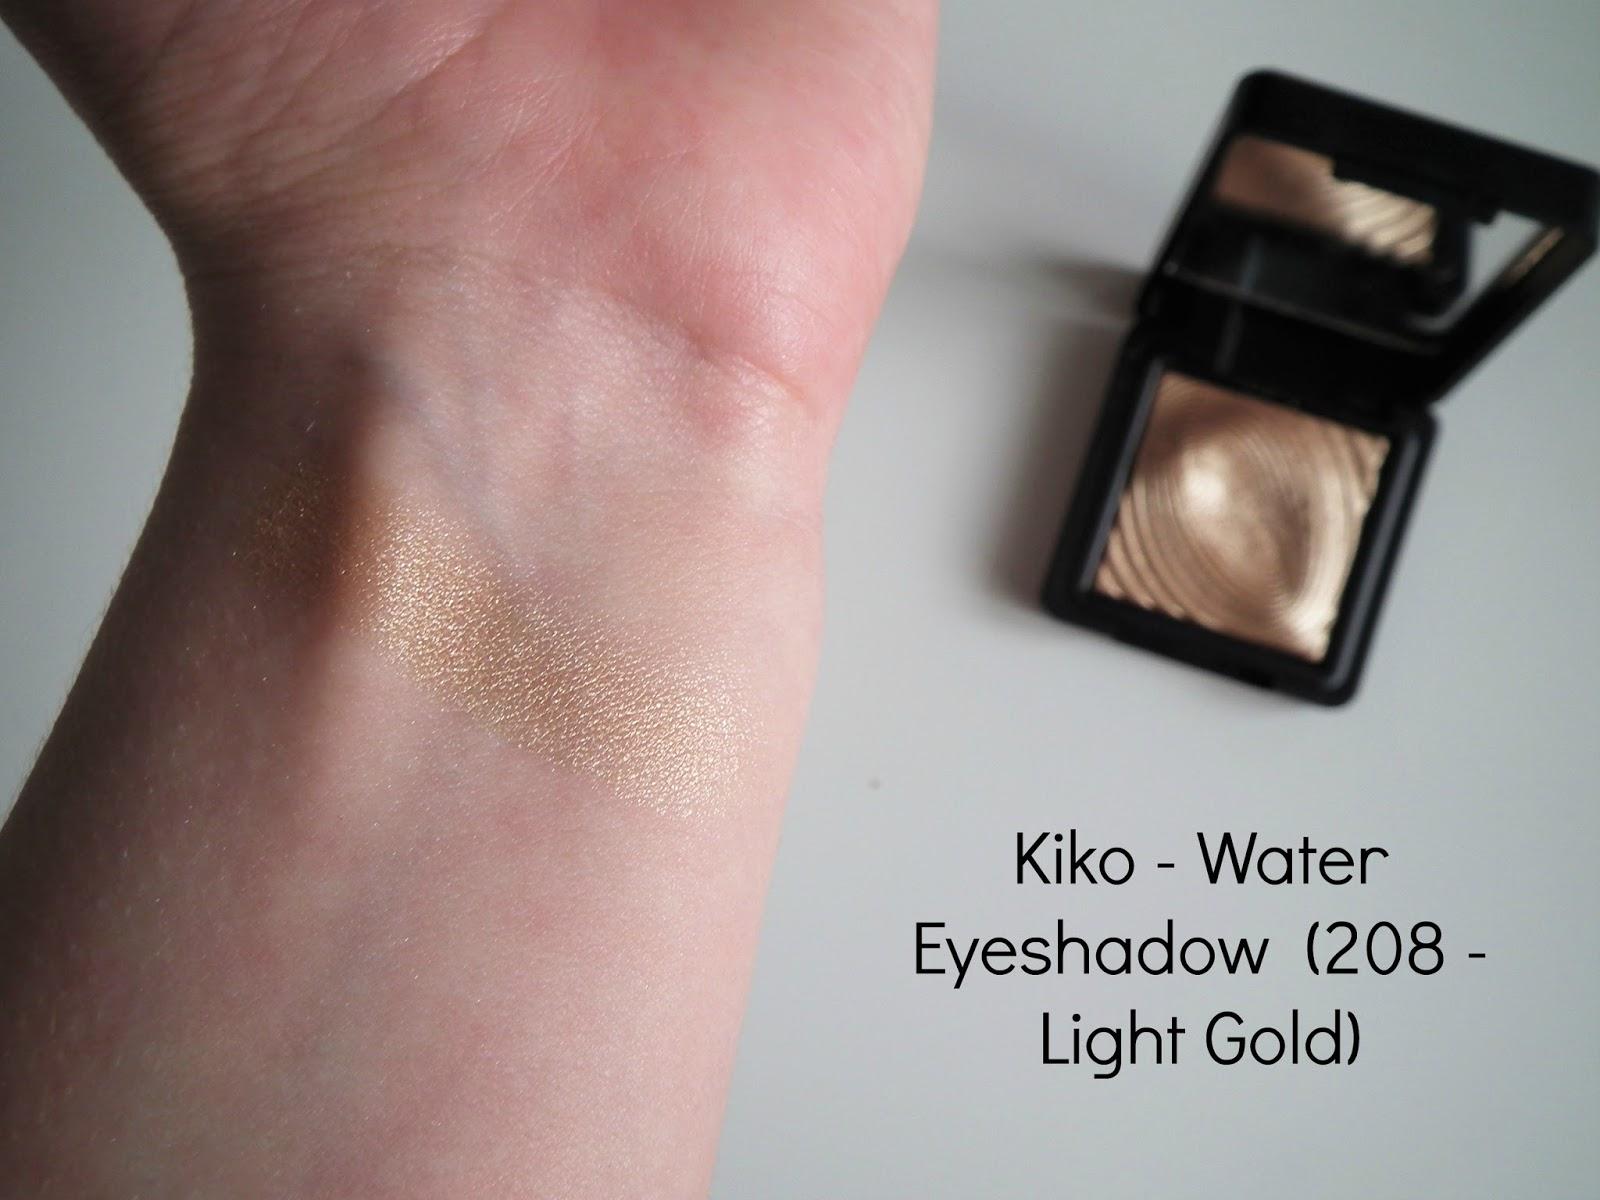 Budget Friendly Highlighters Kiko 208 Light Gold